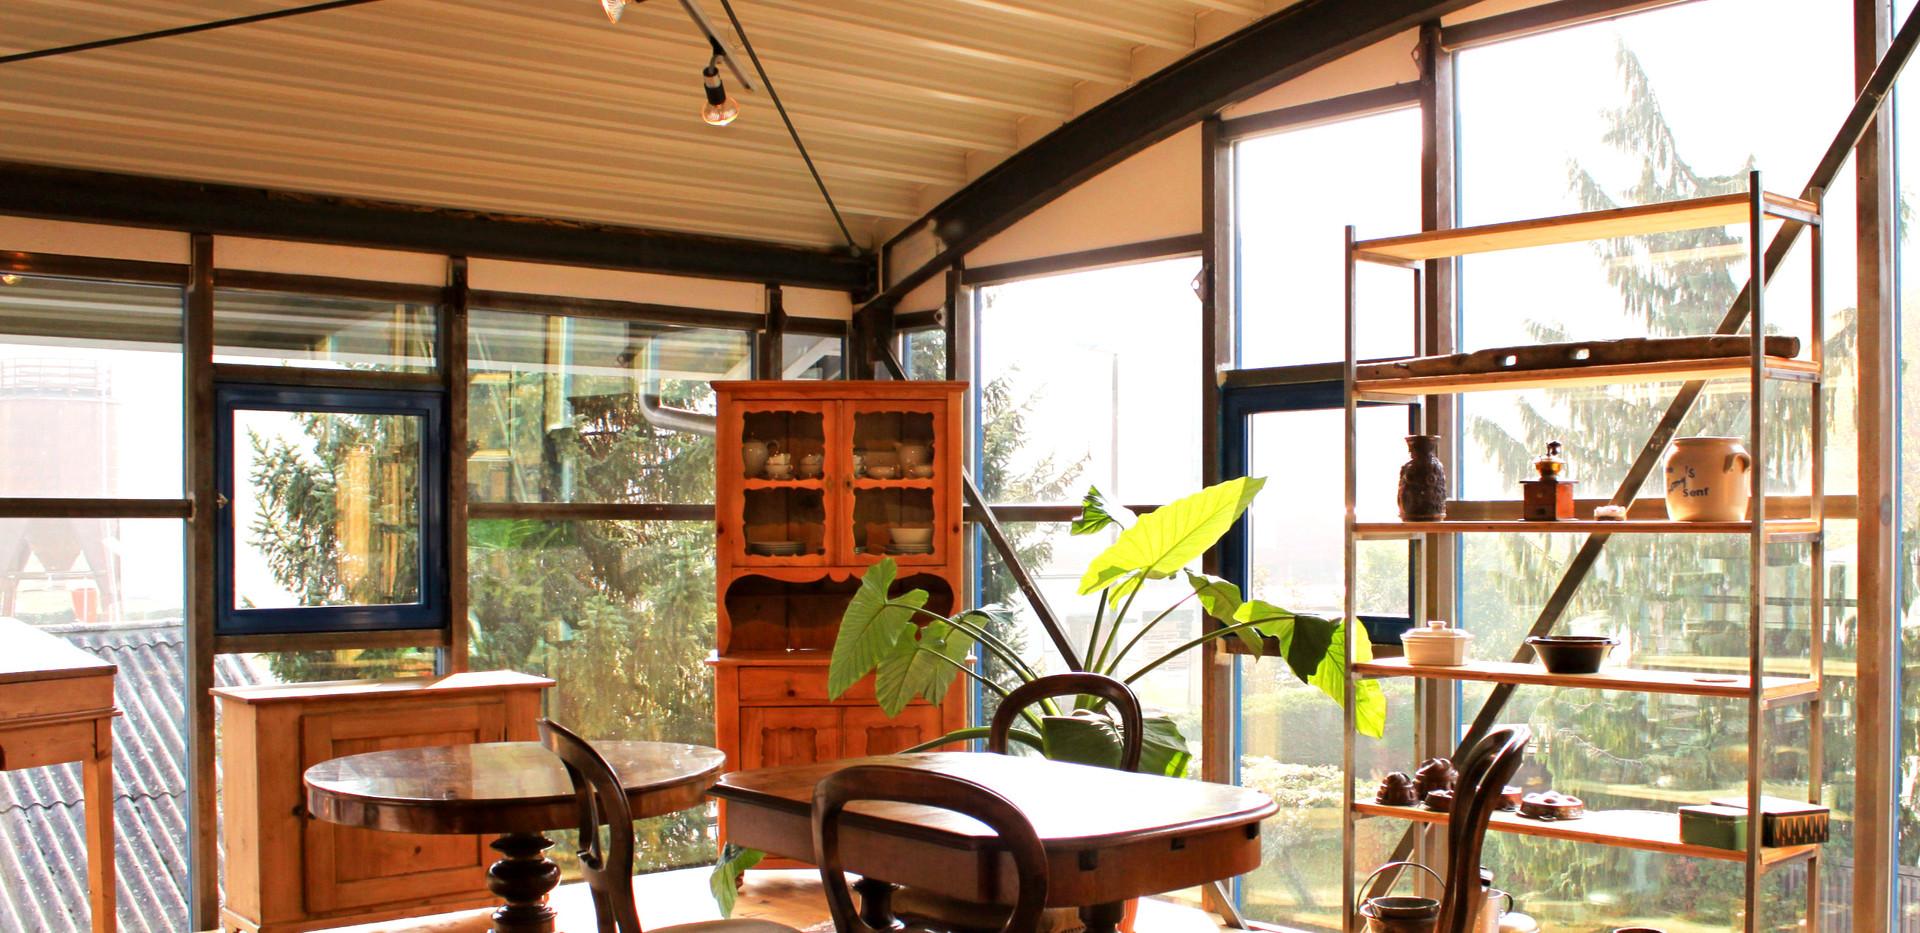 Galerie oben 7.jpg